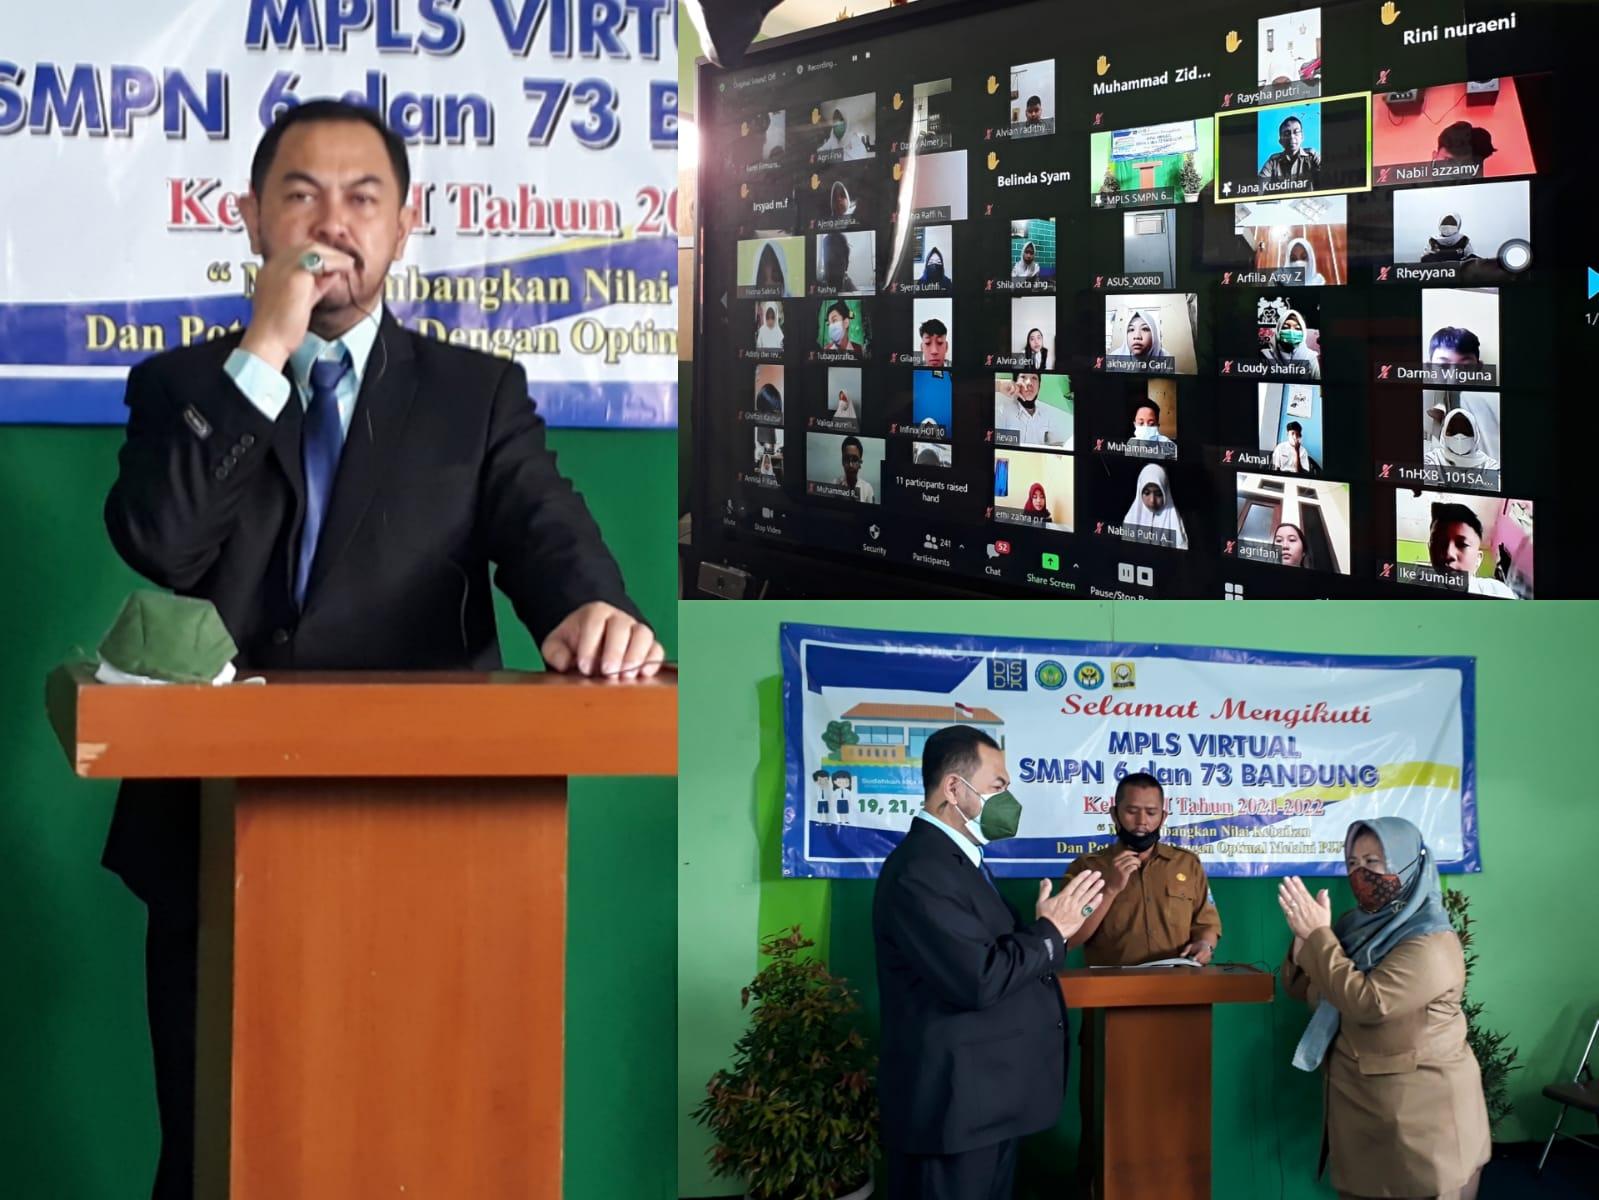 MPLS Tahun Ajaran 2021-2022 SMPN 6 dan SMPN 73 Kota Bandung